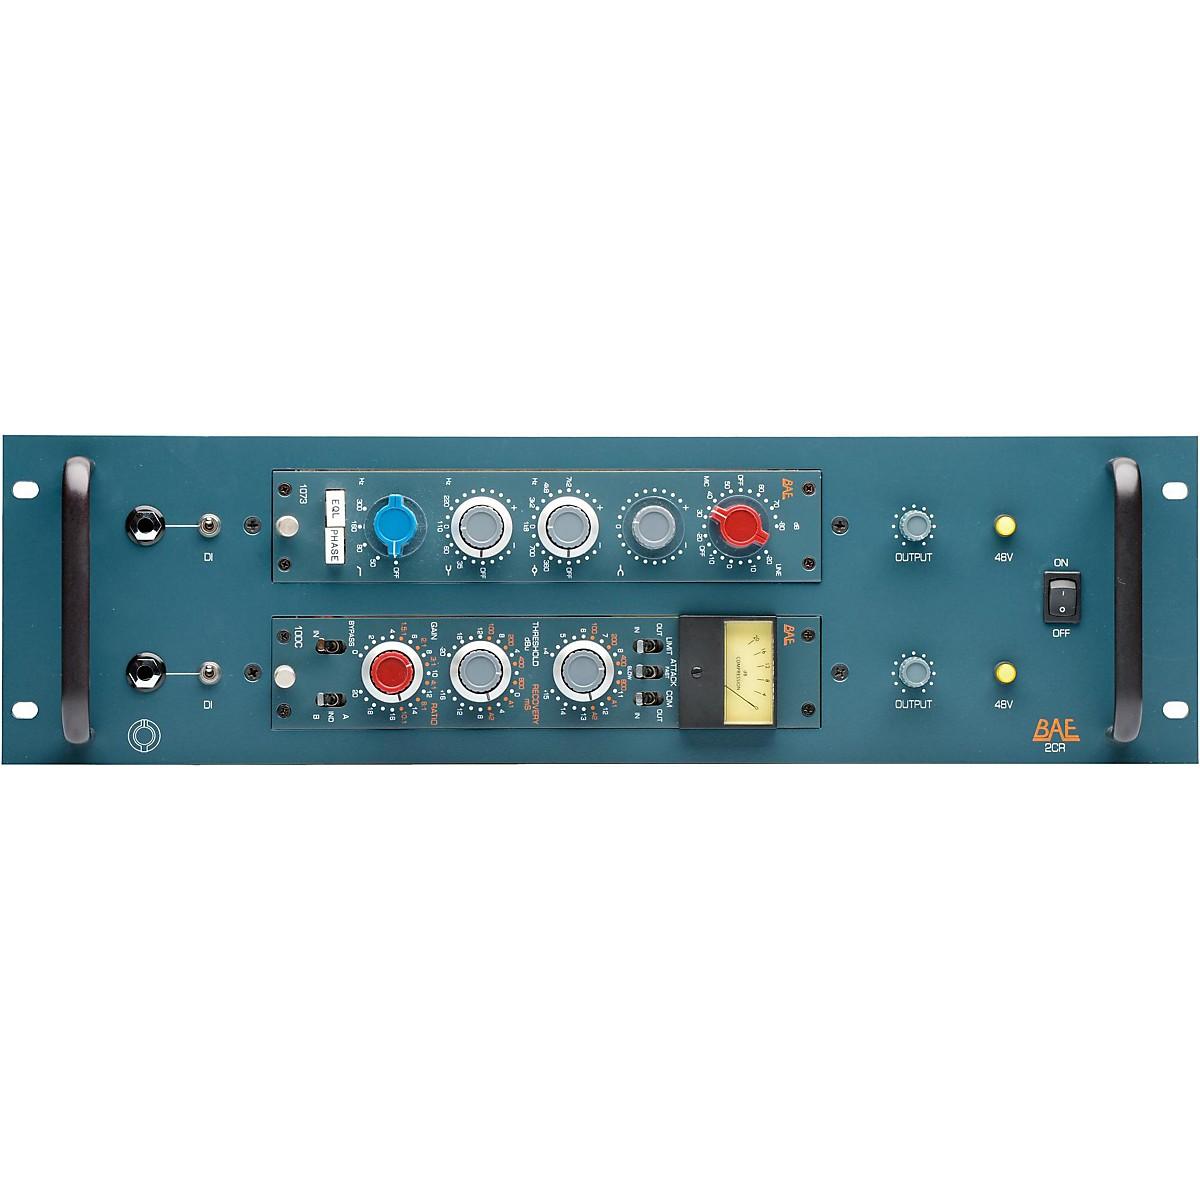 BAE 2CR 2-Channel Powered Rack